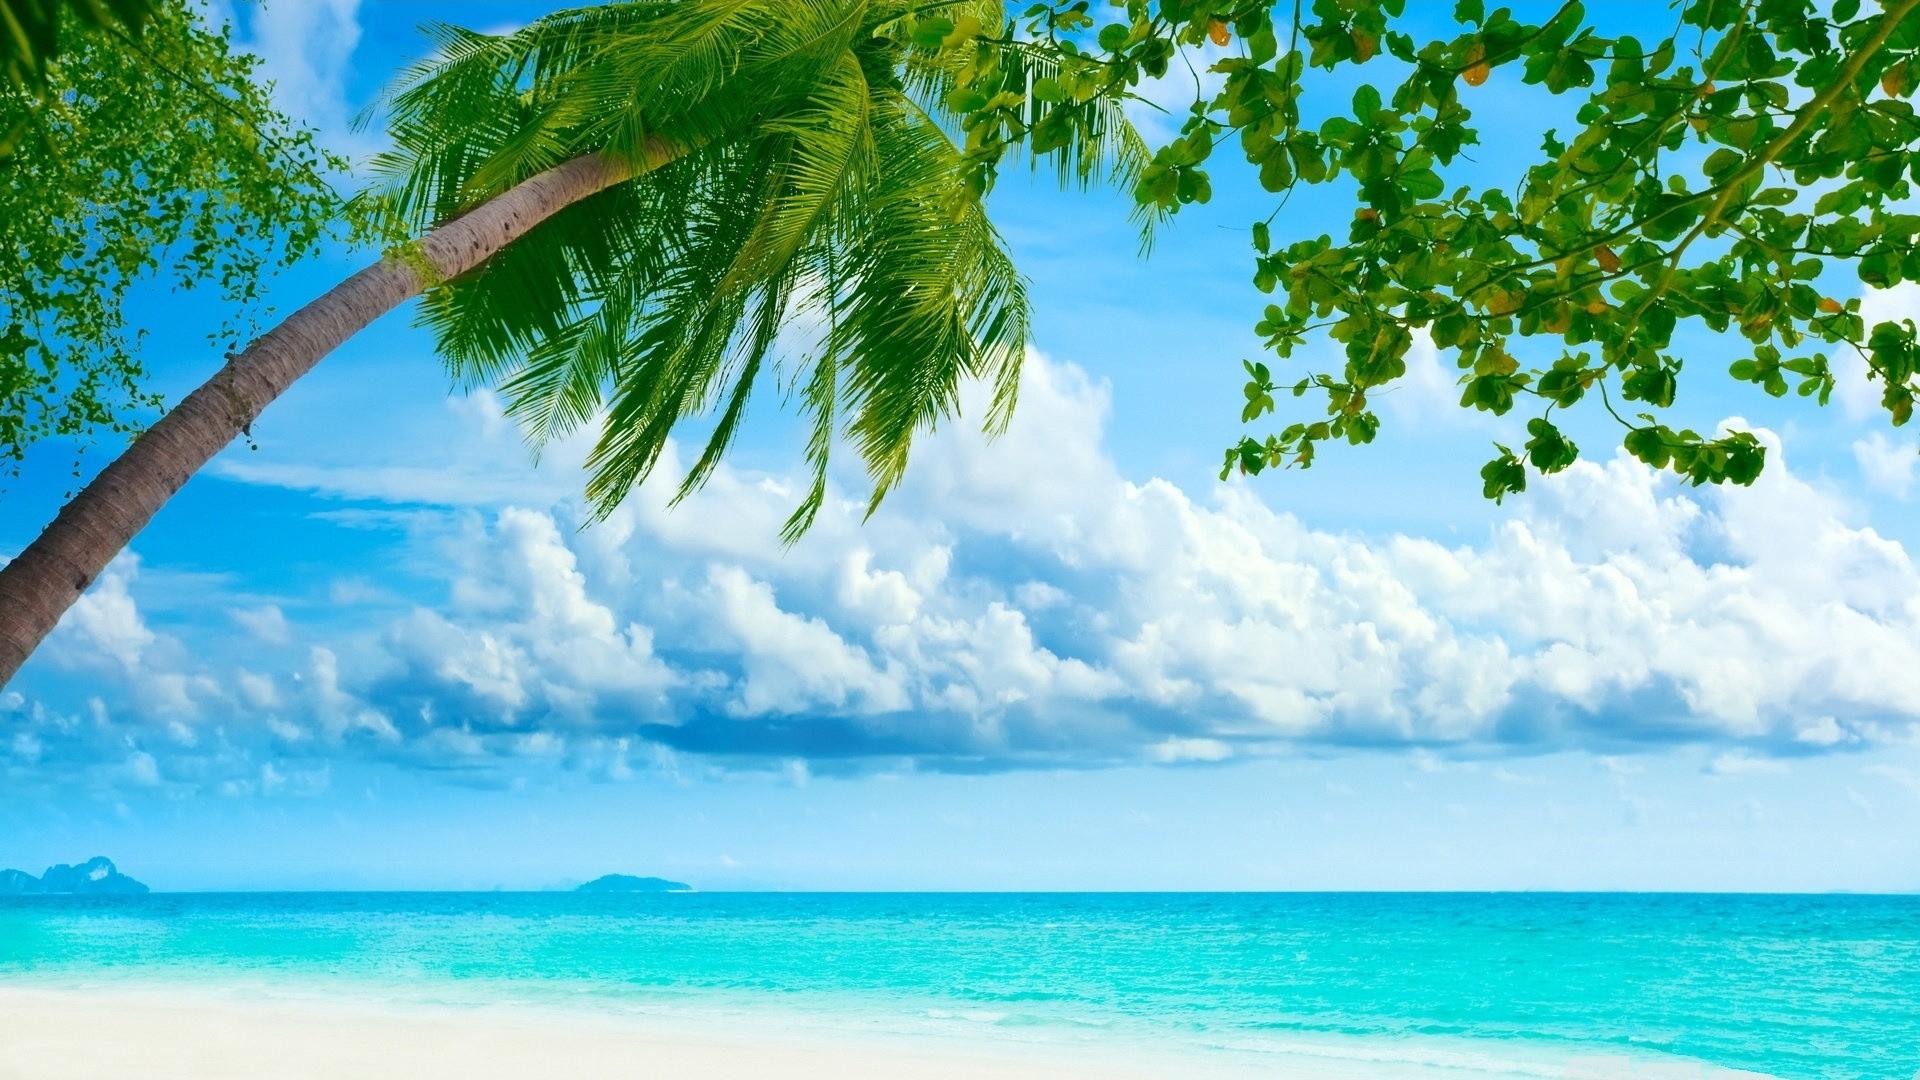 Tropical Island Desktop Wallpaper 1